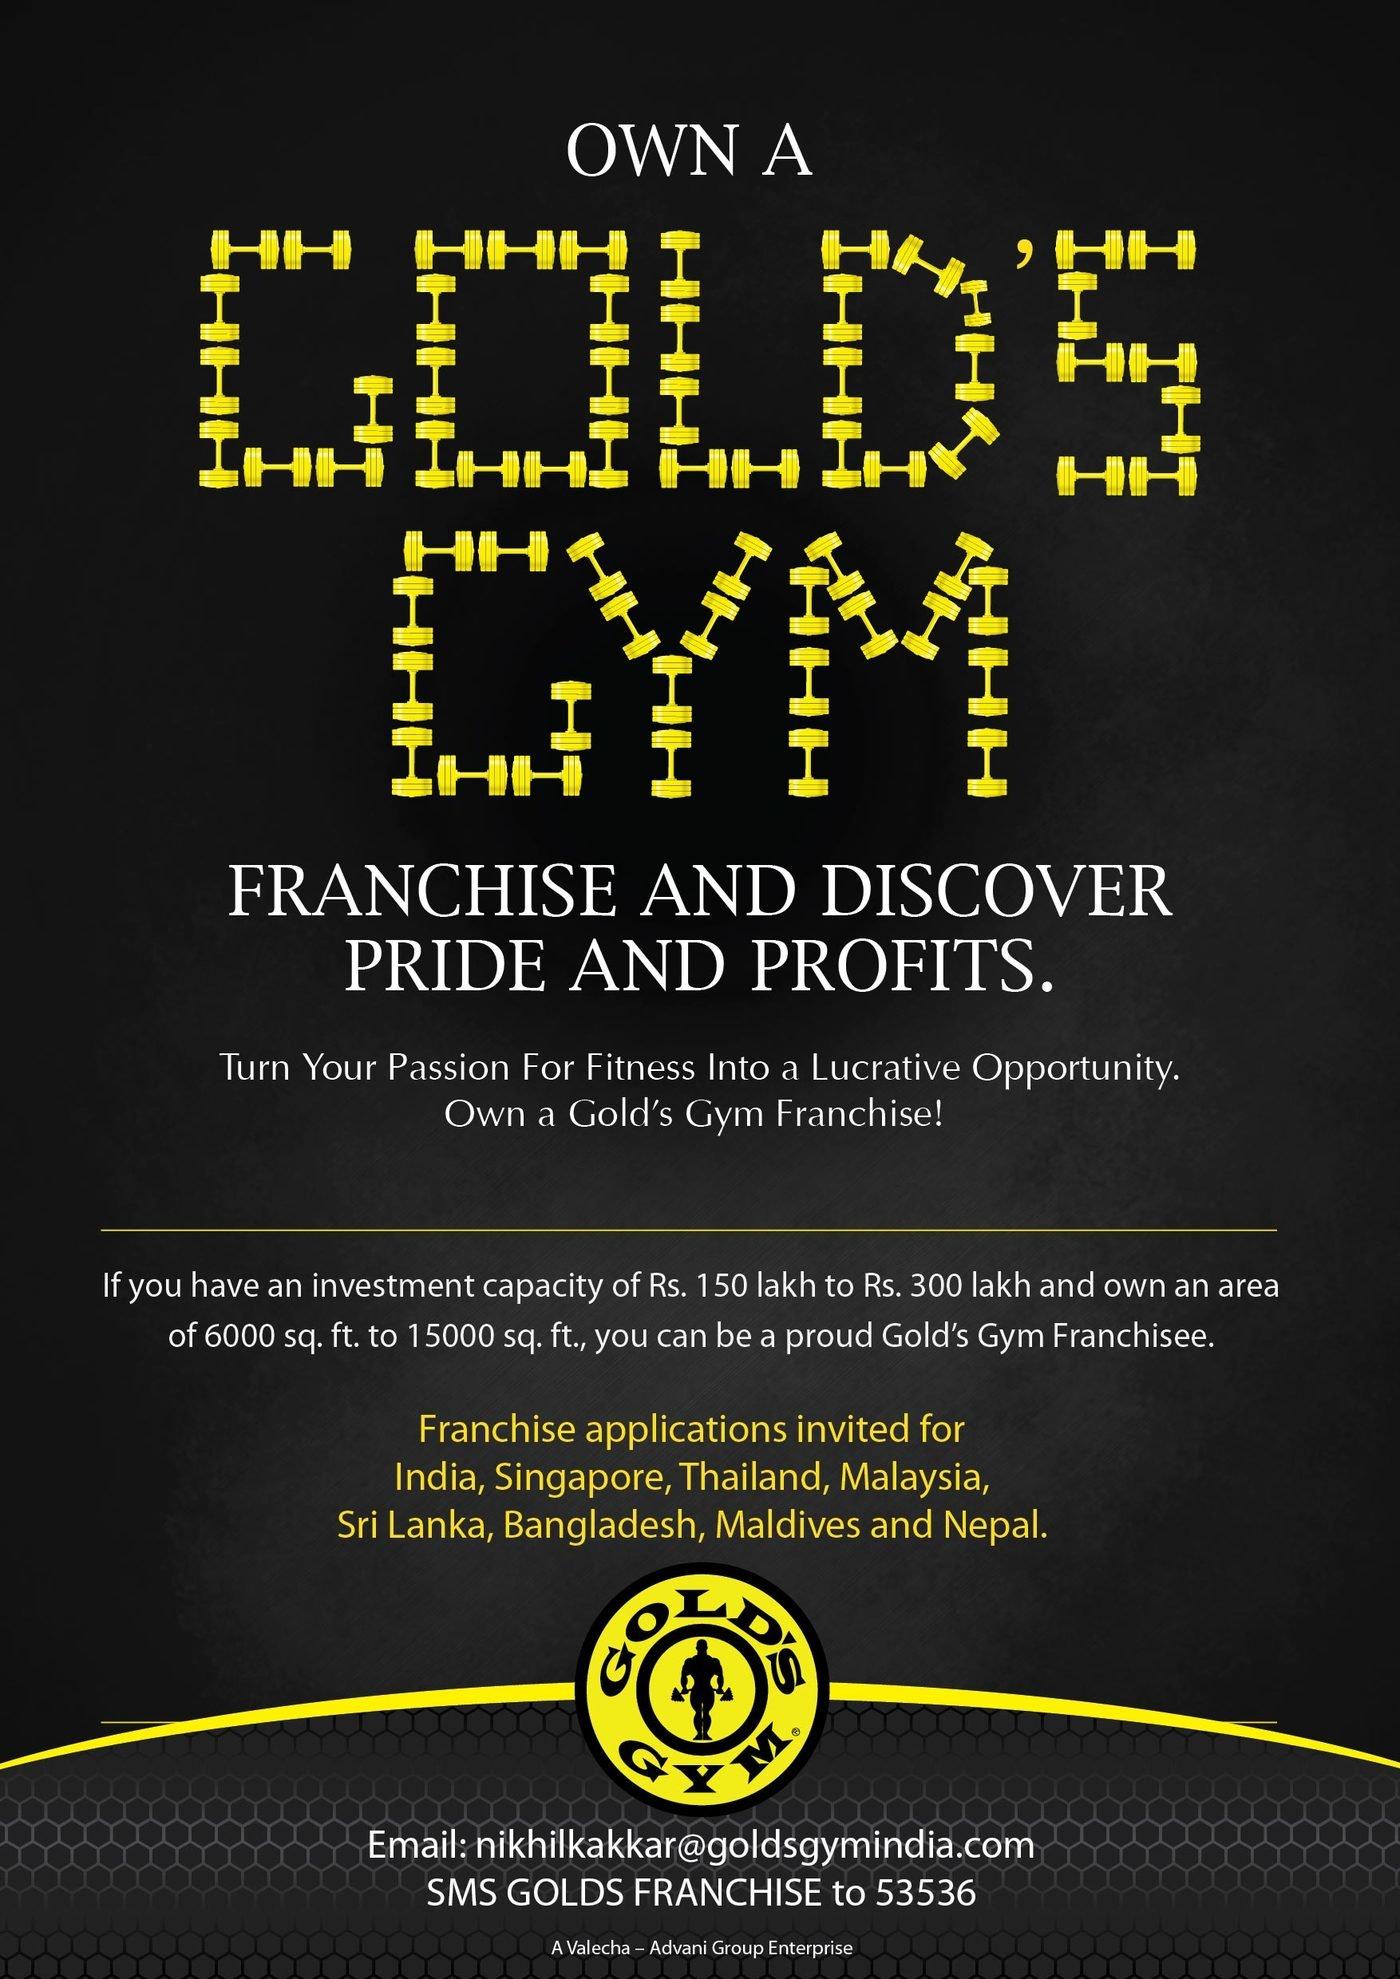 Gold S Gym Franchise Ad By Aditi Satpute At Coroflot Com